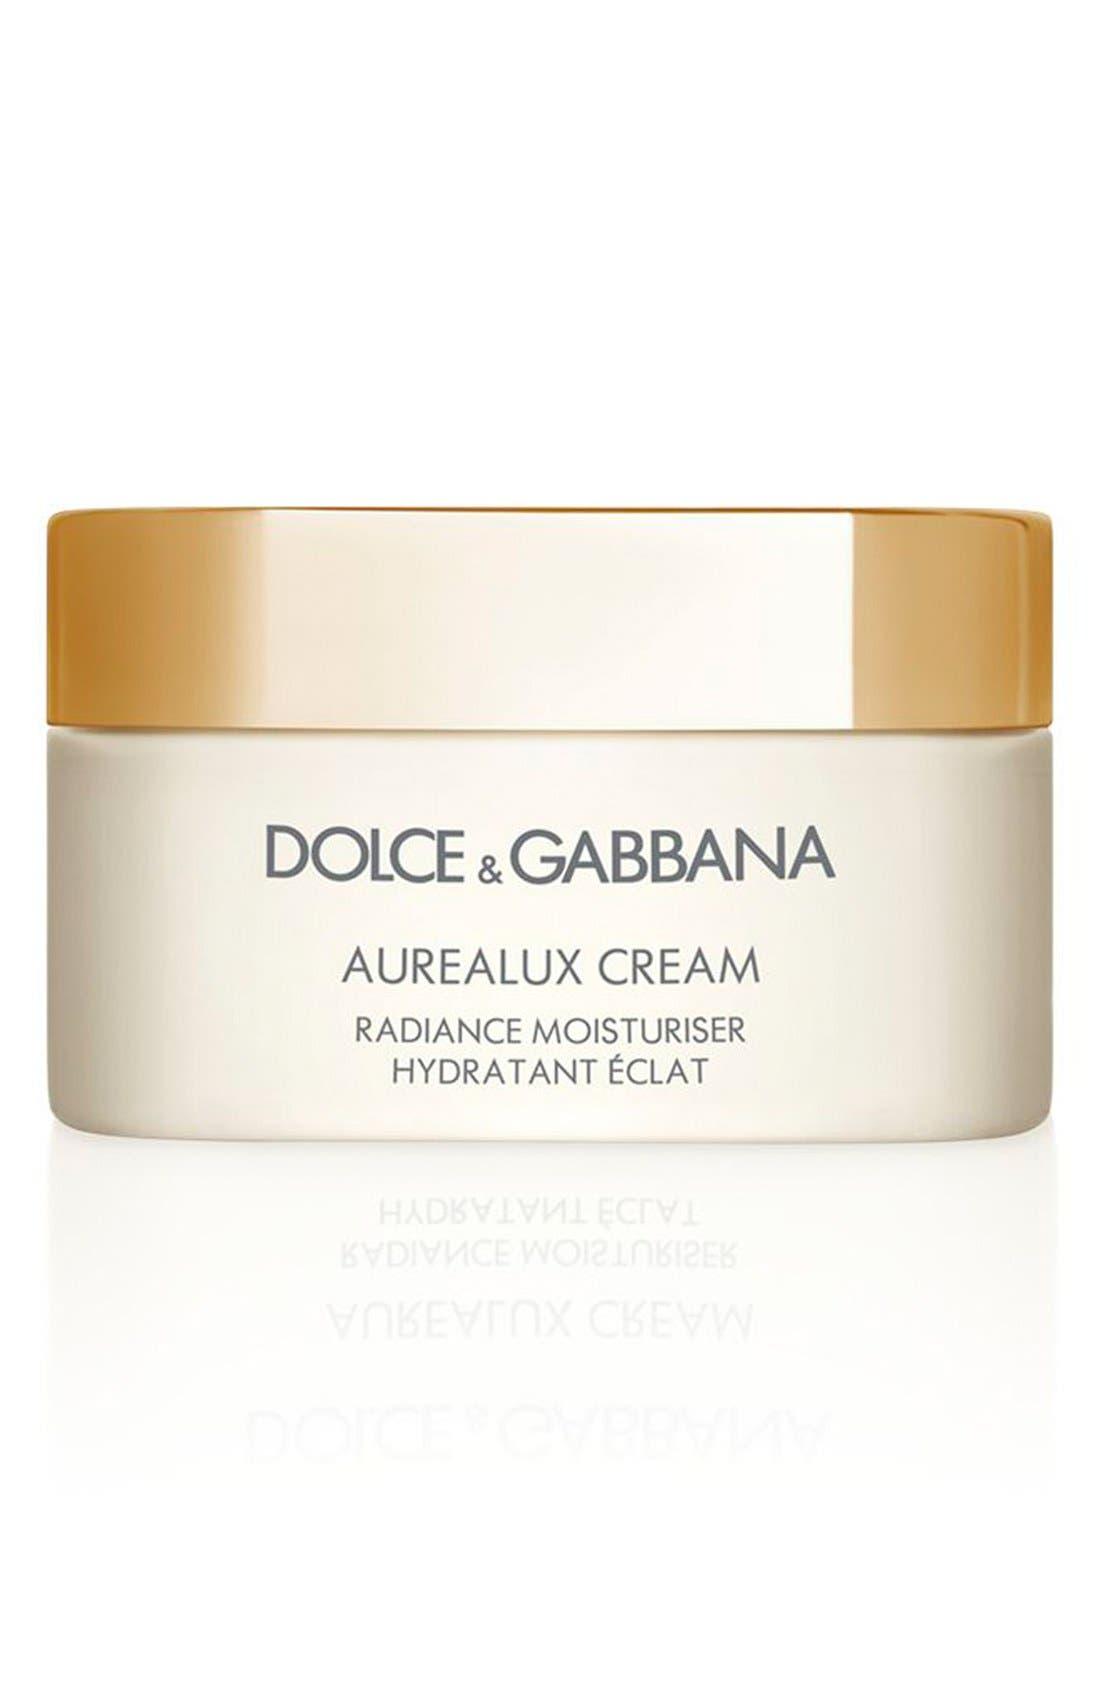 Dolce&GabbanaBeauty 'Aurealux' Cream Radiance Moisturizer,                             Main thumbnail 1, color,                             000